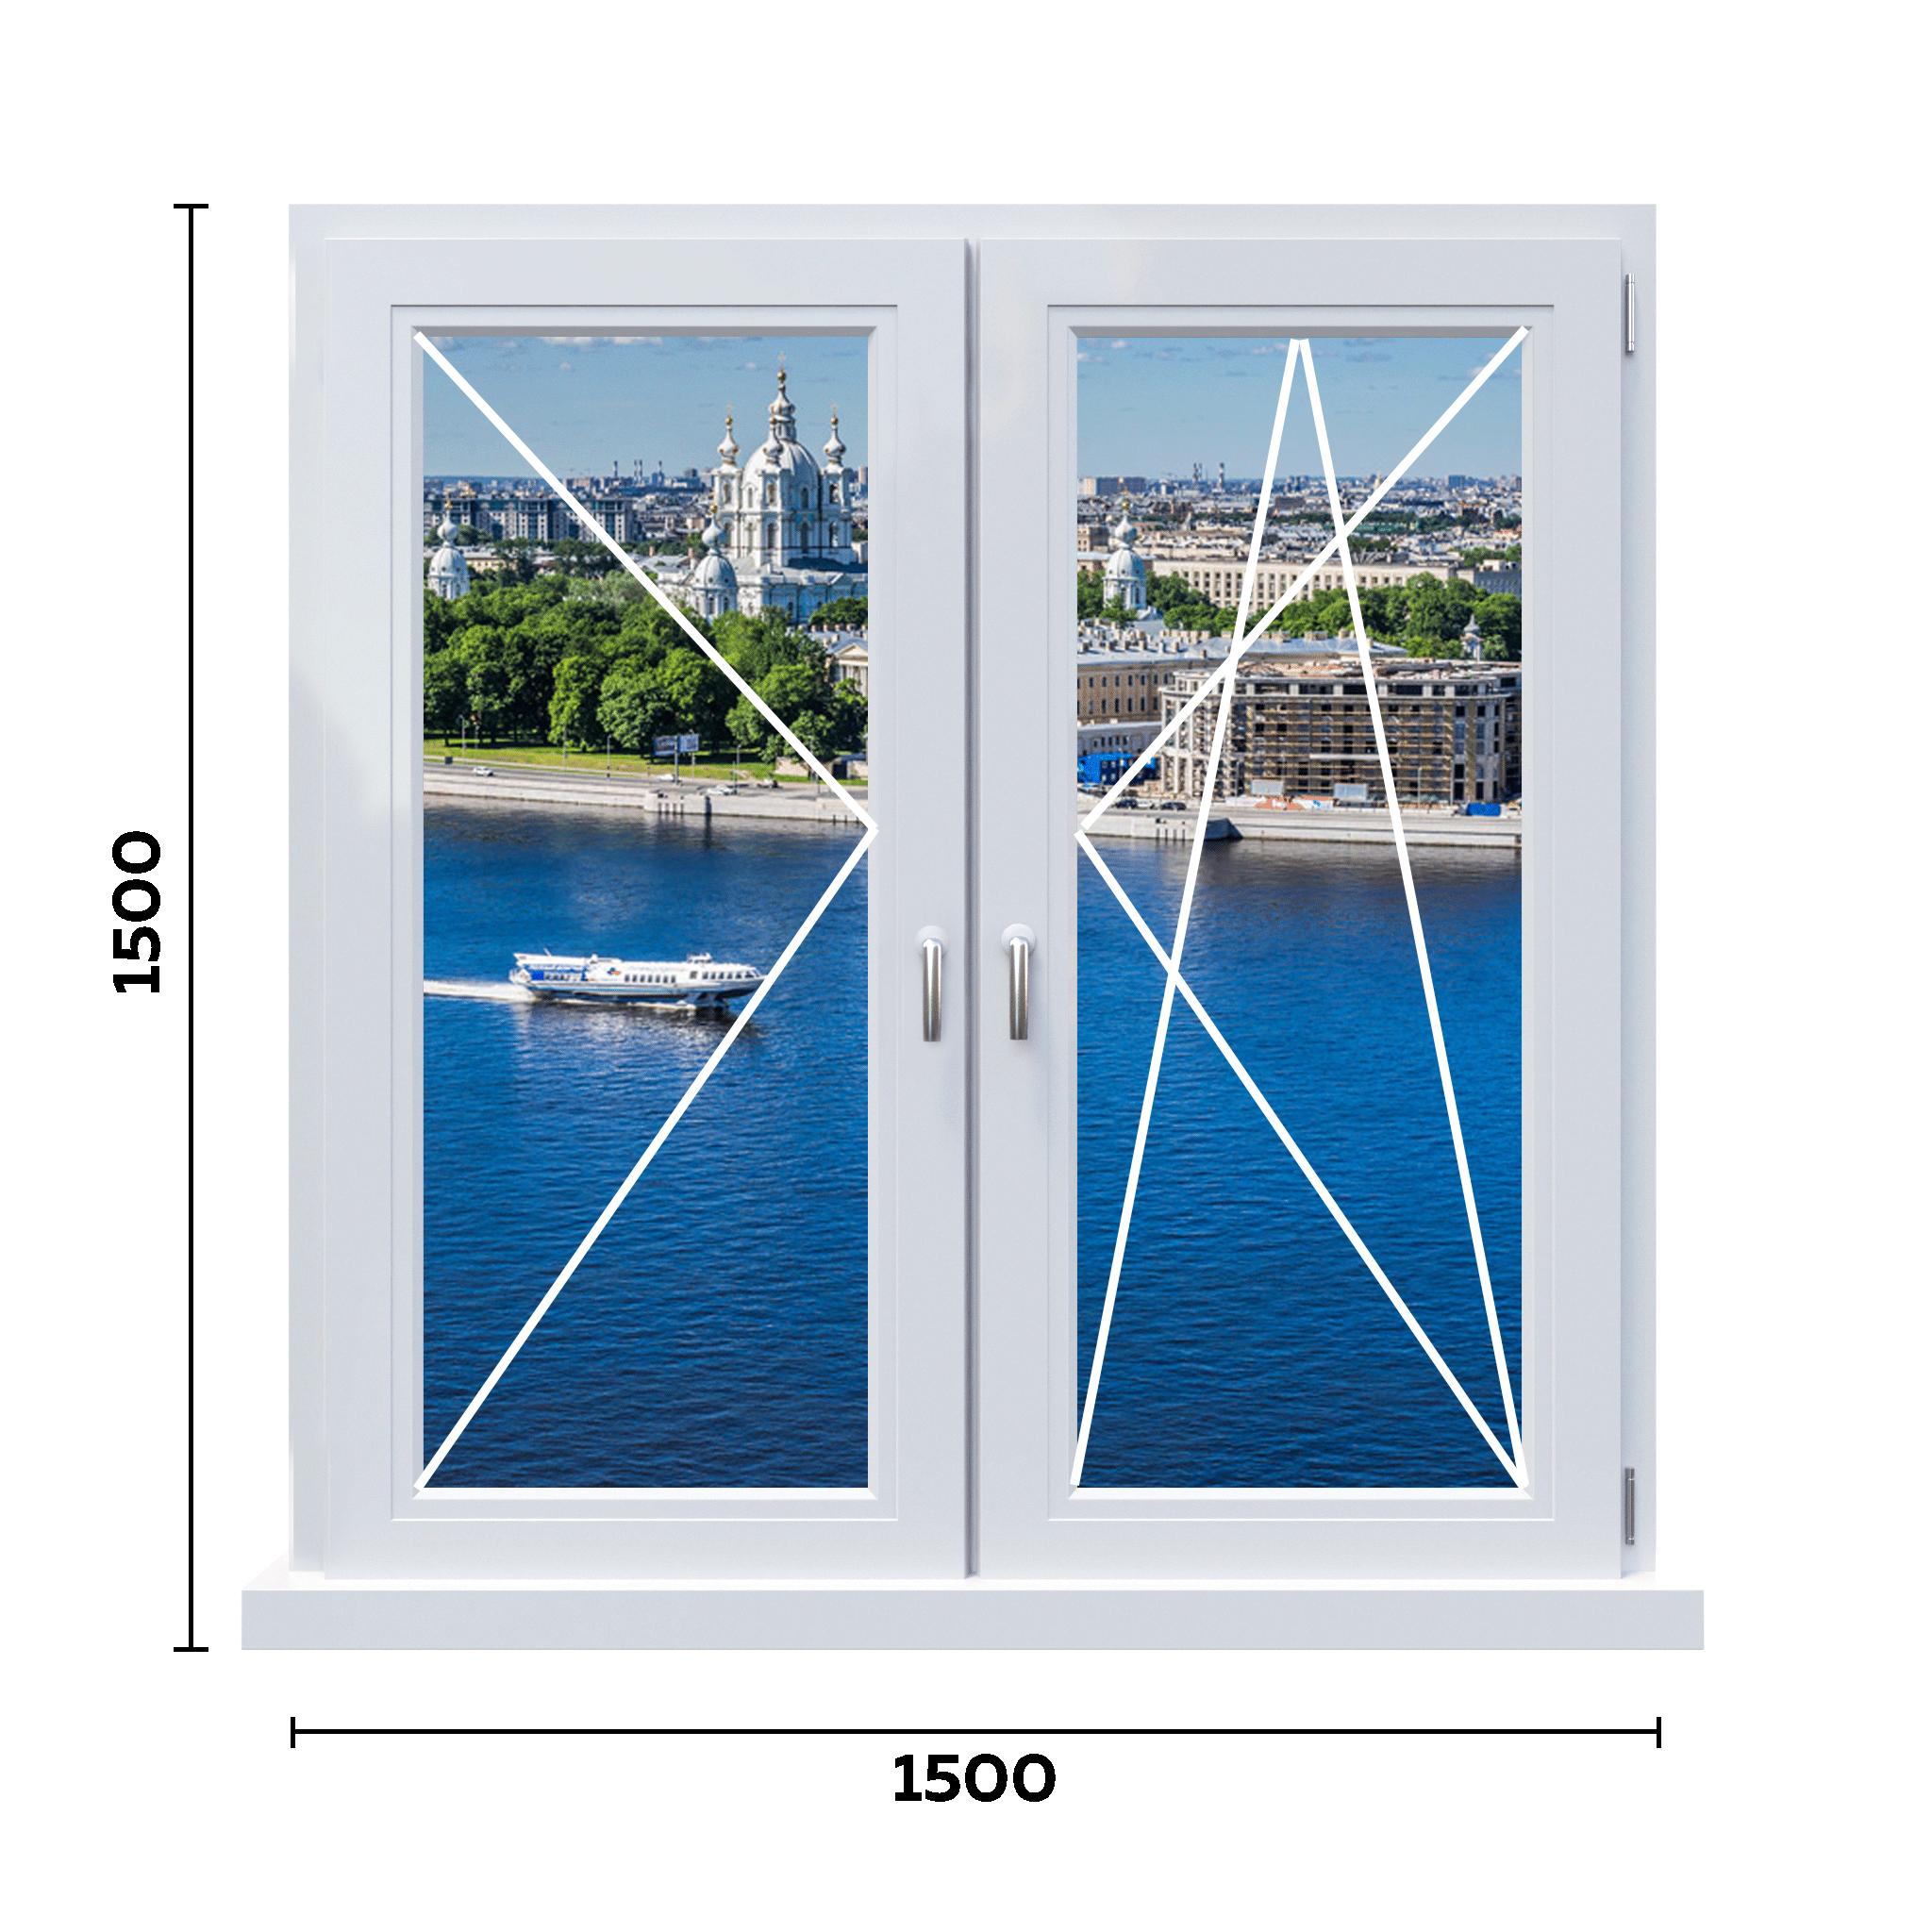 схема окна 1500мм вариант 3